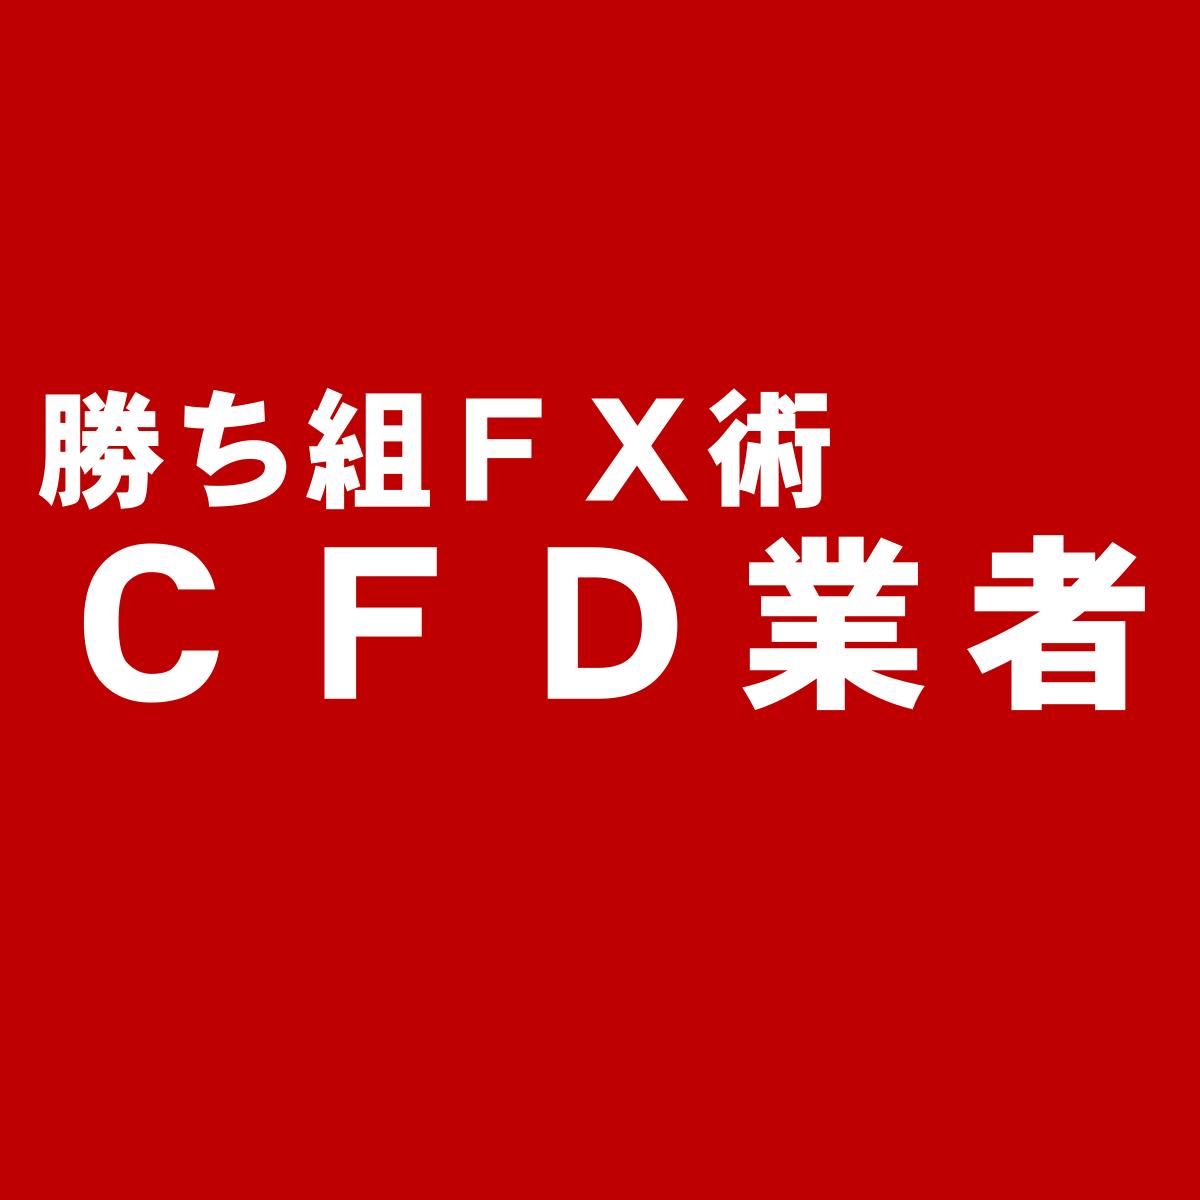 CFD業者